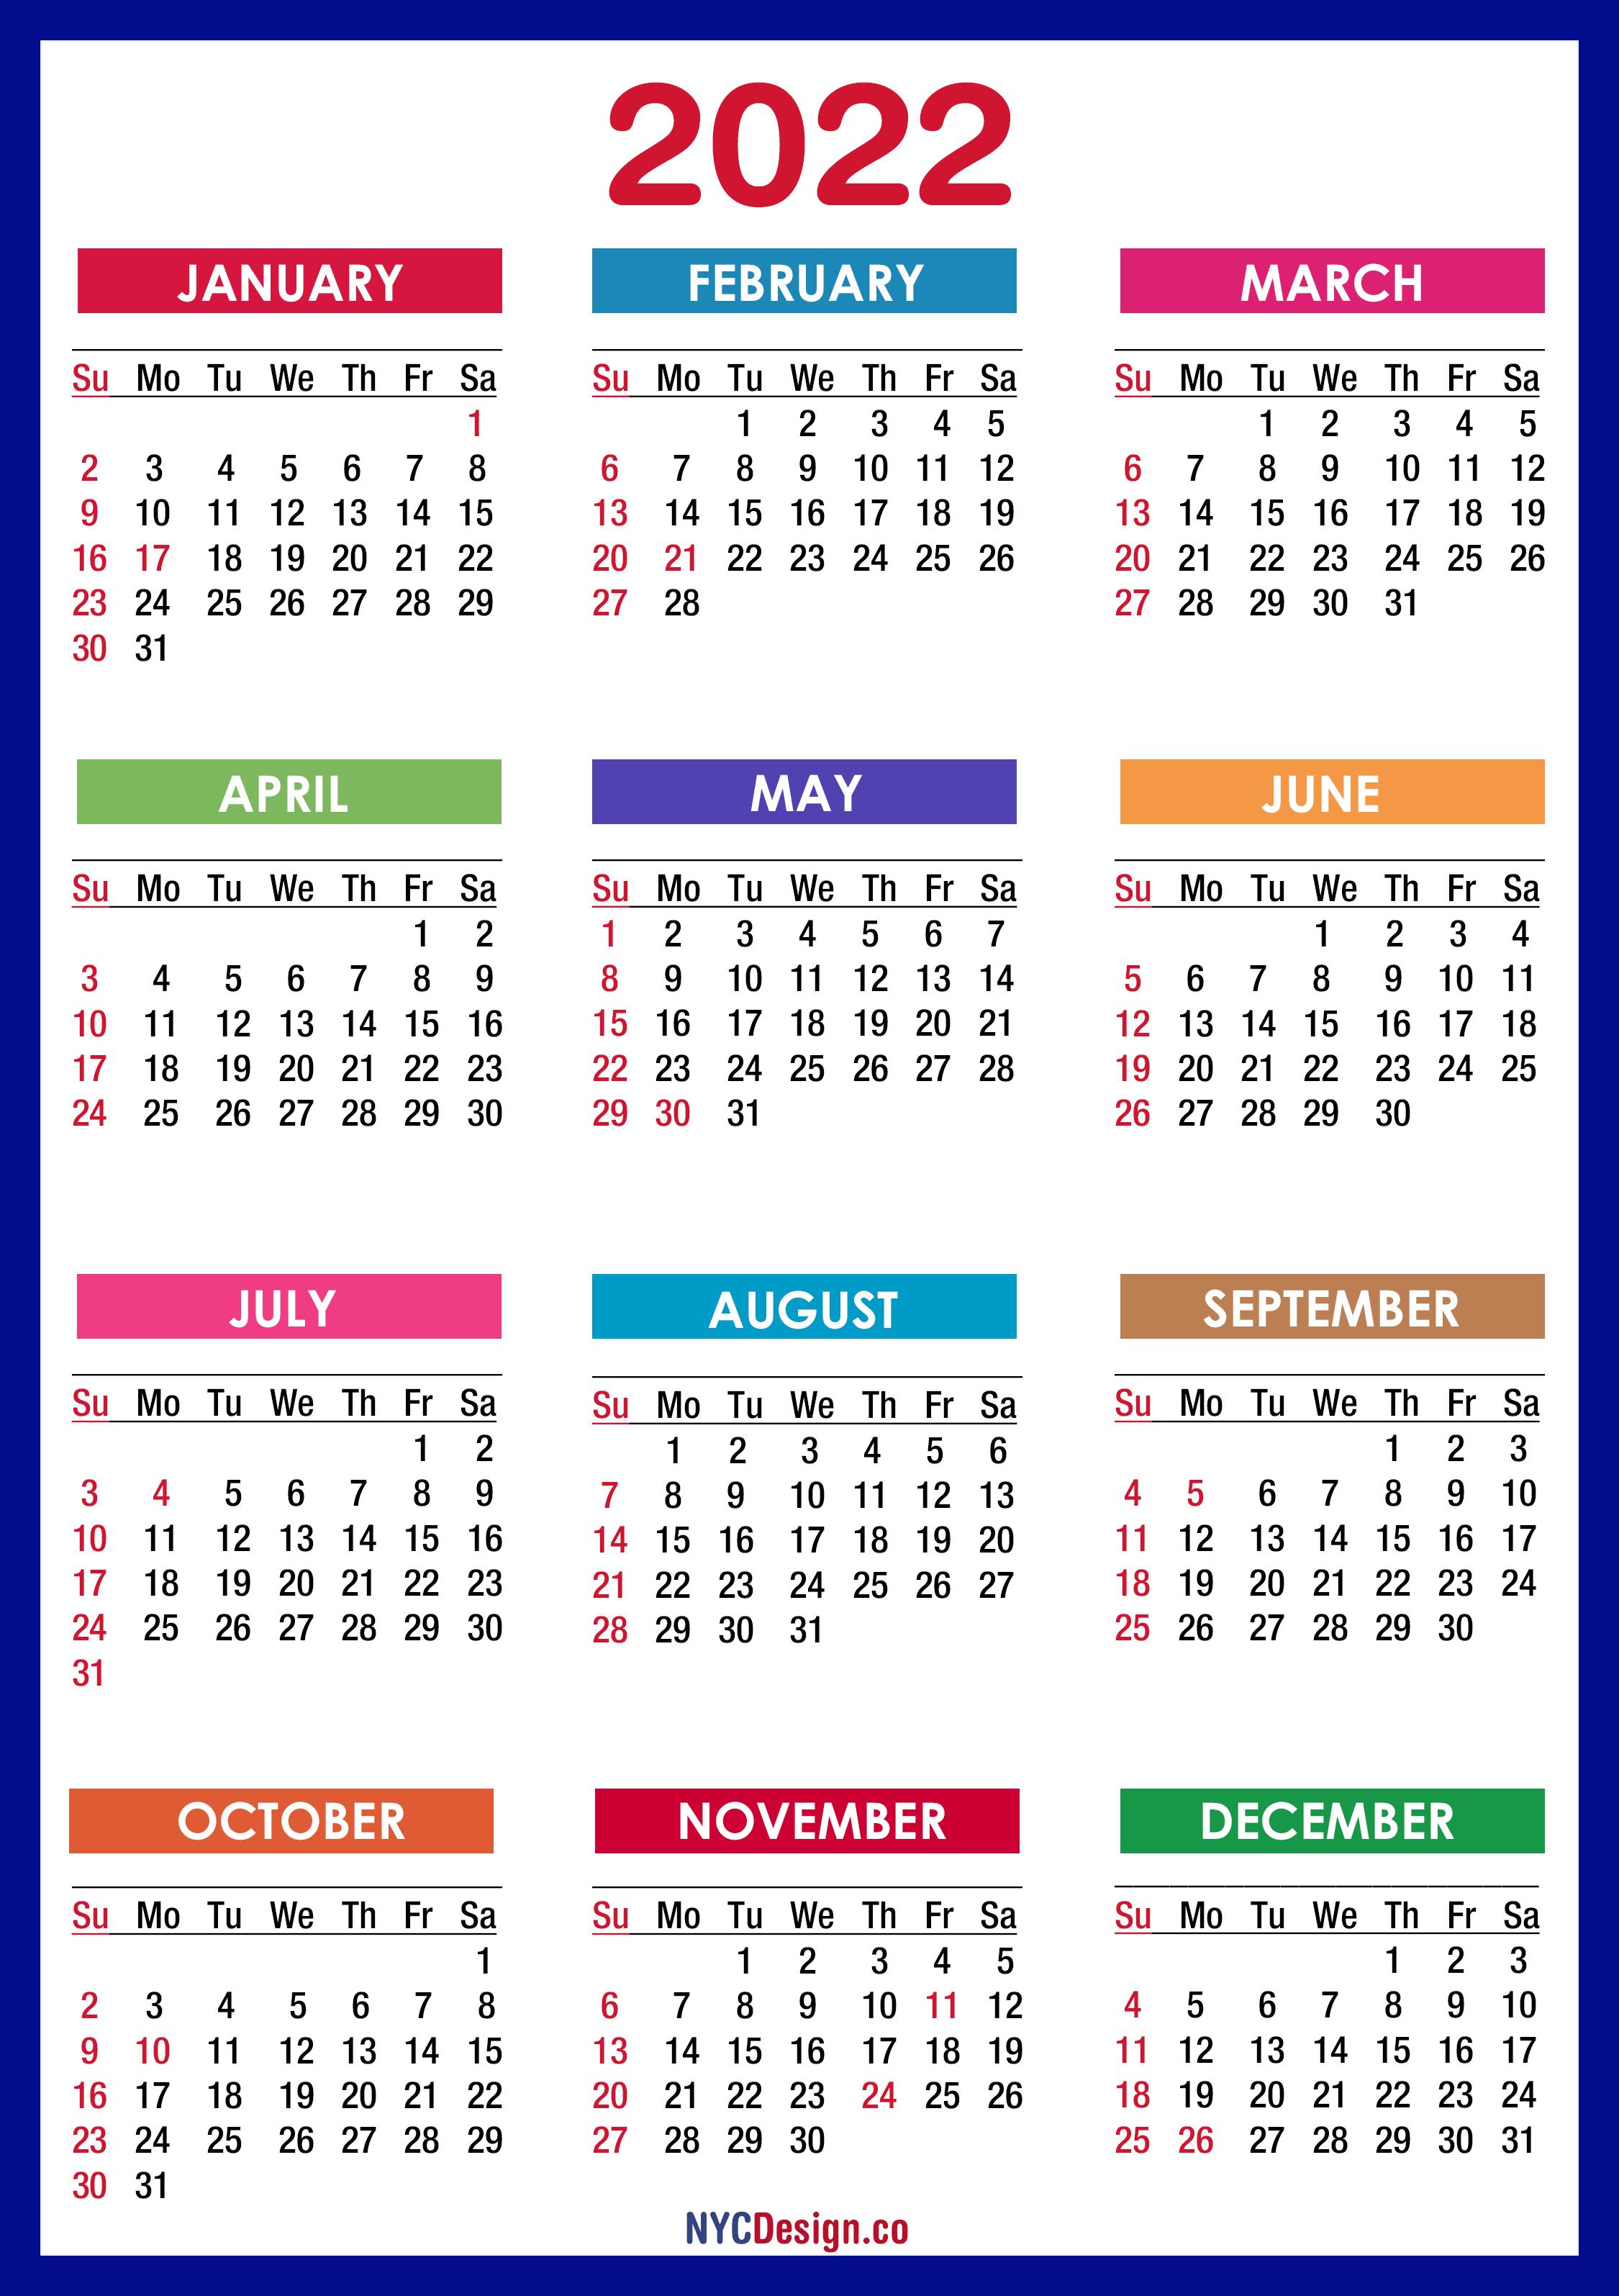 2022 Us Calendar.2022 Calendar With Holidays Printable Free Pdf Colorful Blue Green Sunday Start Nycdesign Co Calendars Printable Free